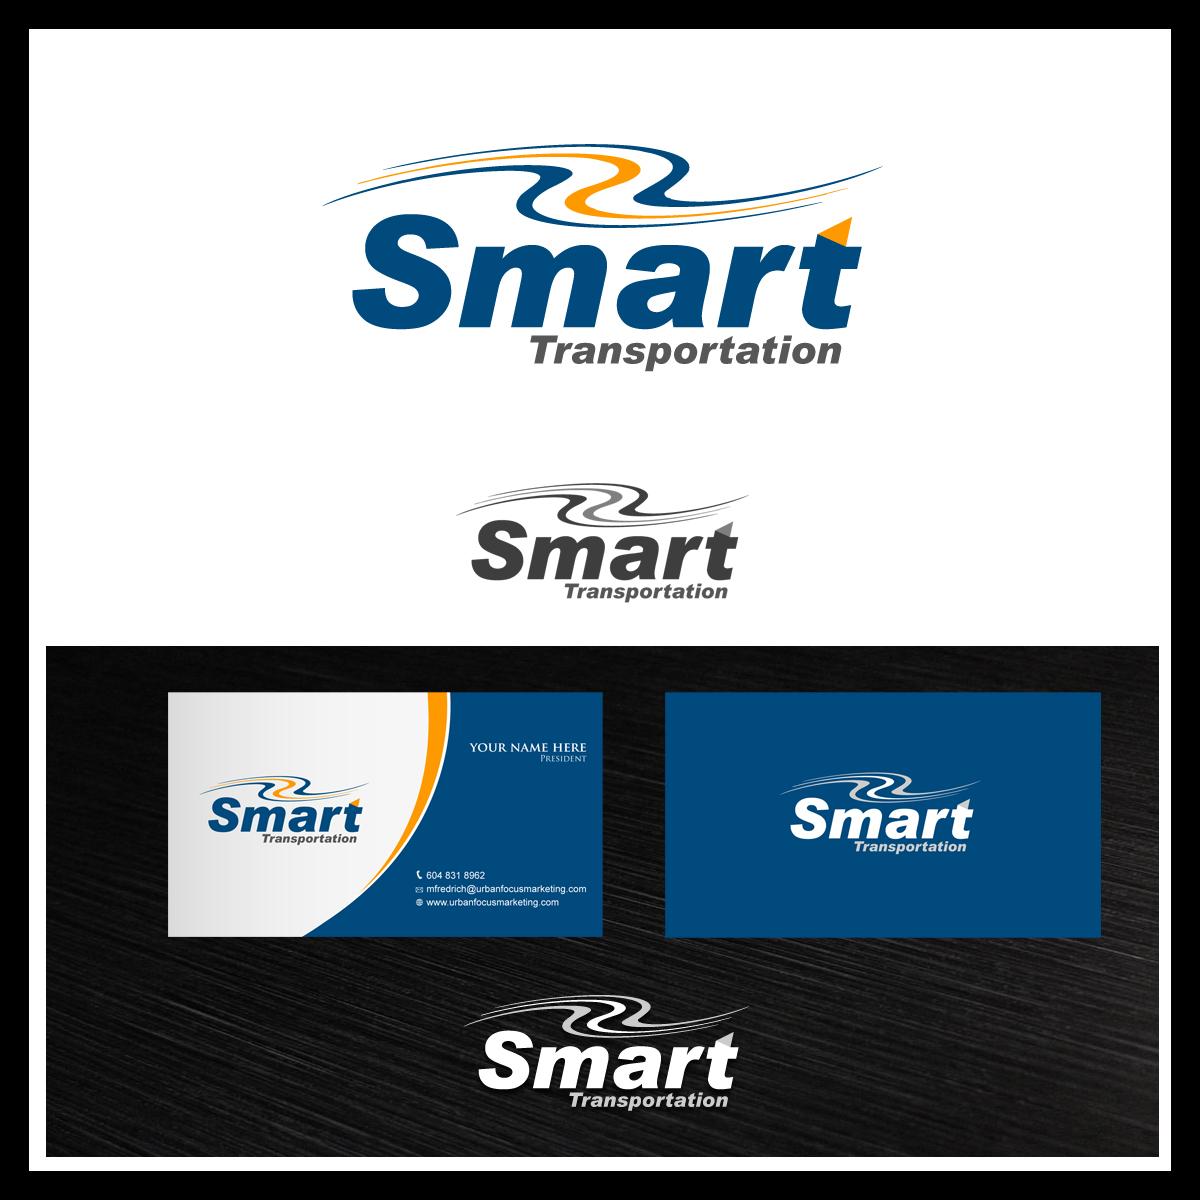 Logo Design by pixdesign - Entry No. 99 in the Logo Design Contest Imaginative Logo Design for Smart Transportation.